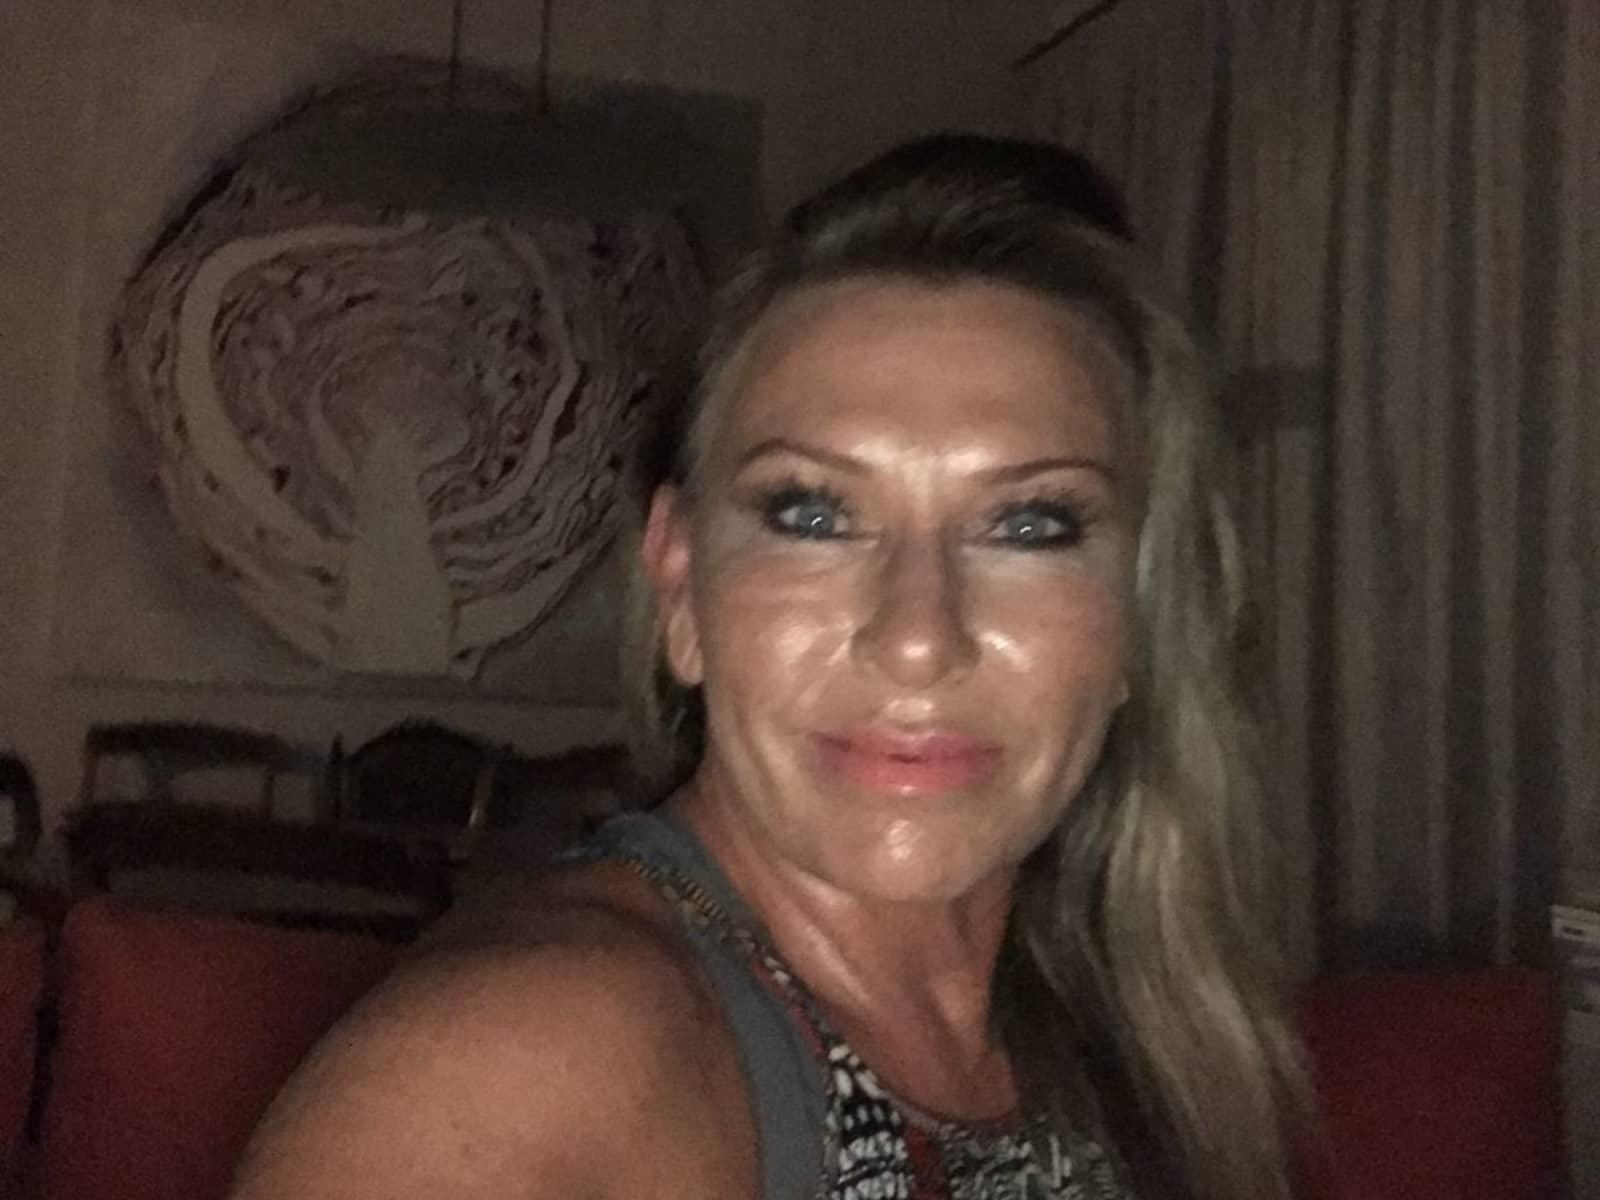 Tonya from Tampa, Florida, United States